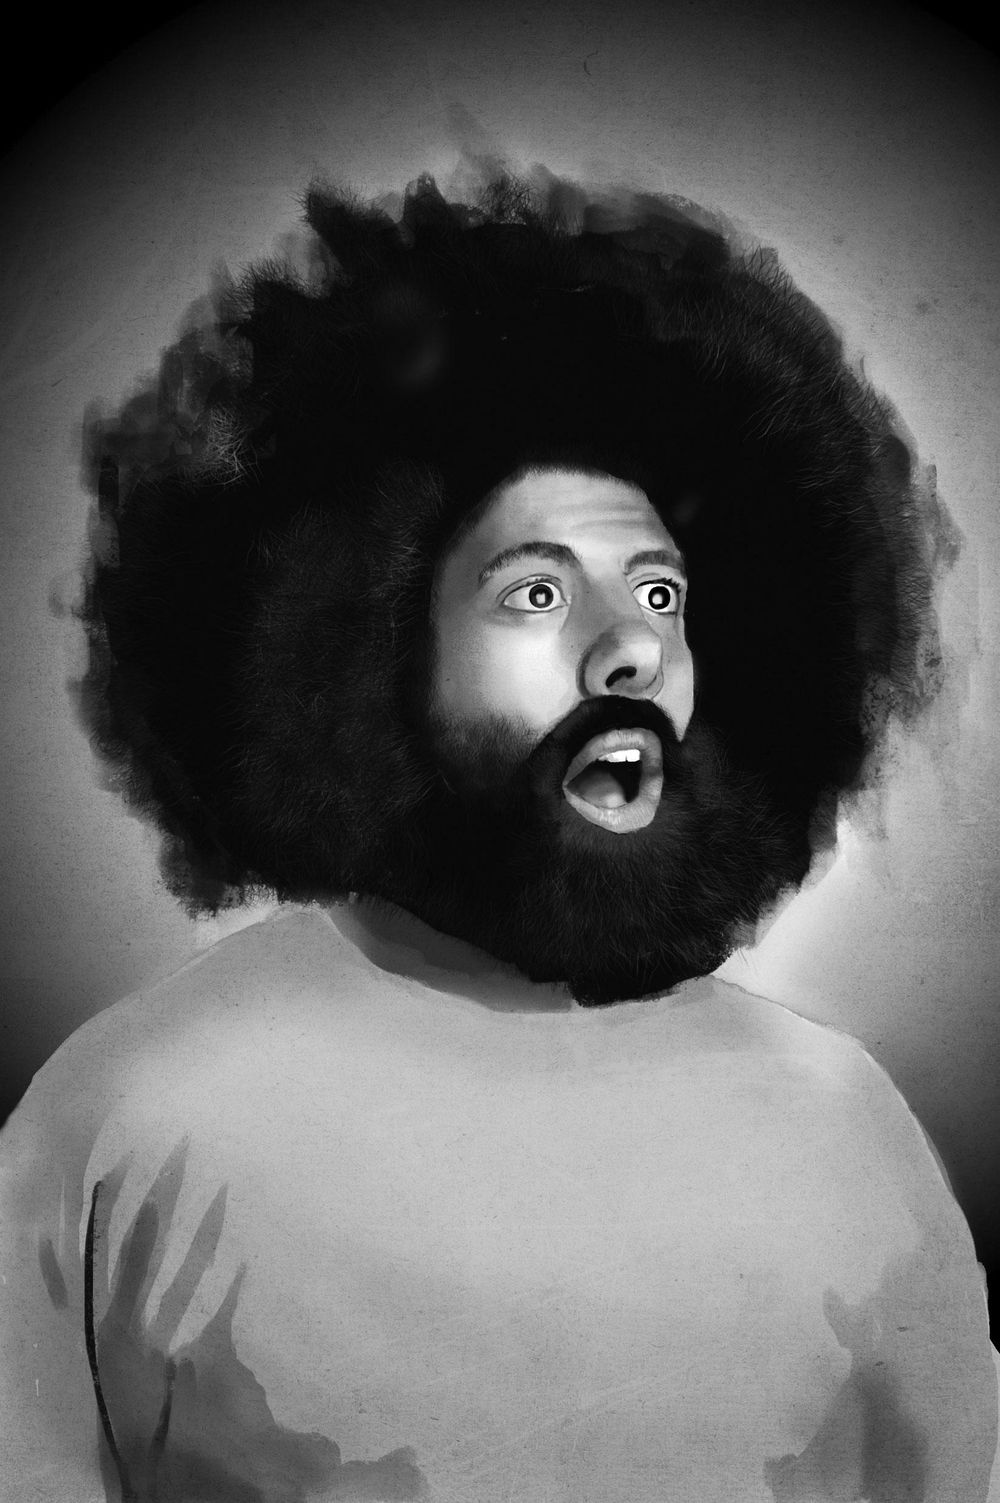 Reggie Watts Portrait - image 4 - student project